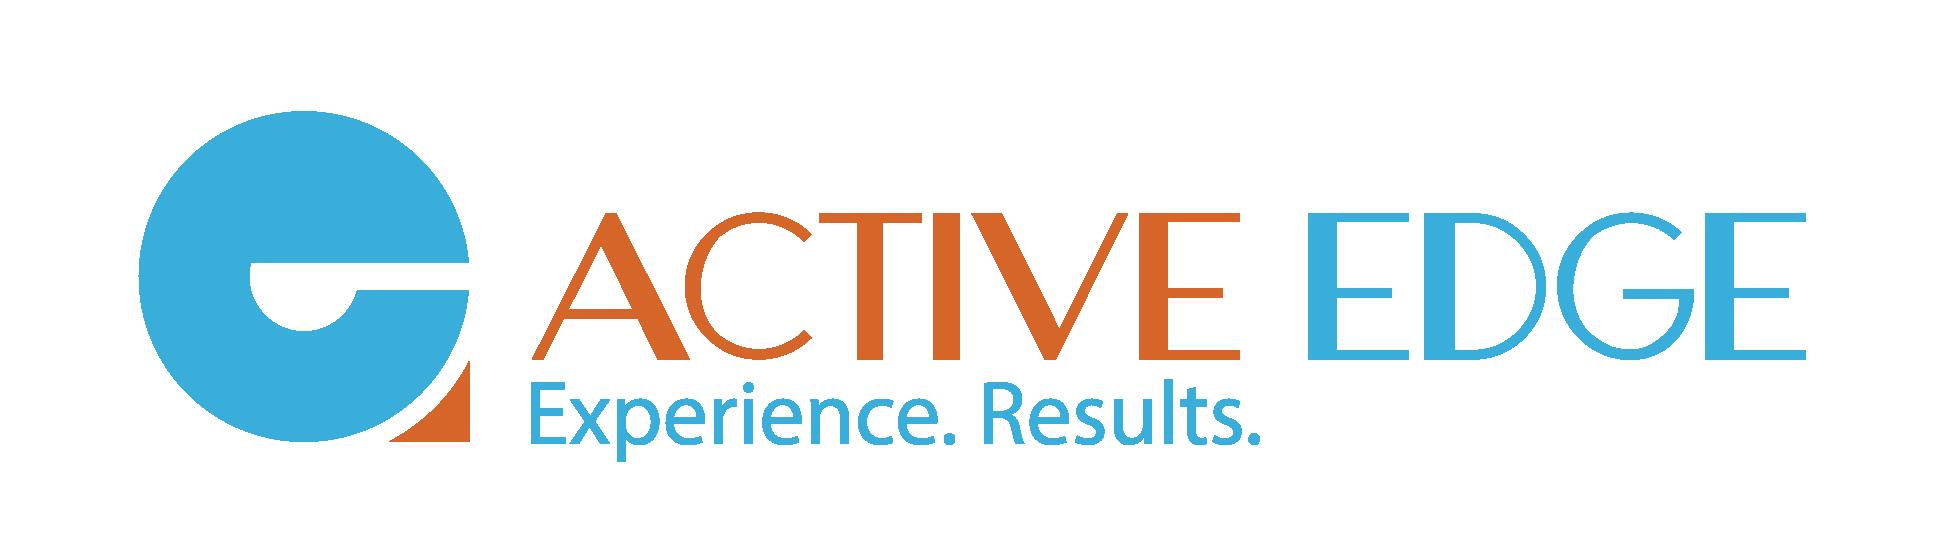 Active Edge Logo - Horizontal